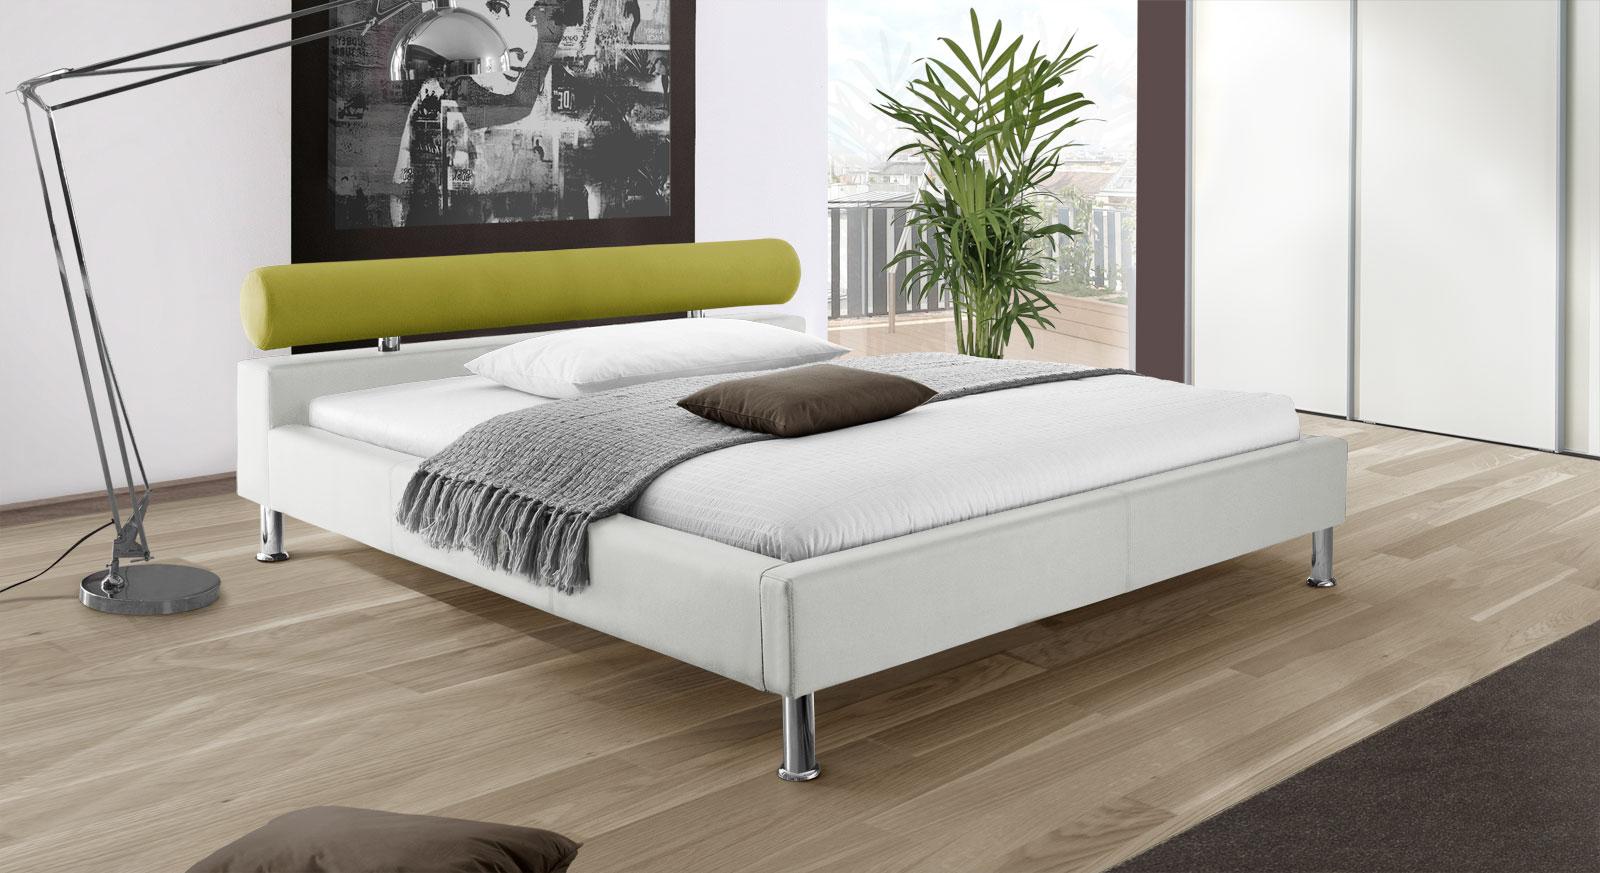 Bett Basildon in weißem Kunstleder mit grünem Stoff